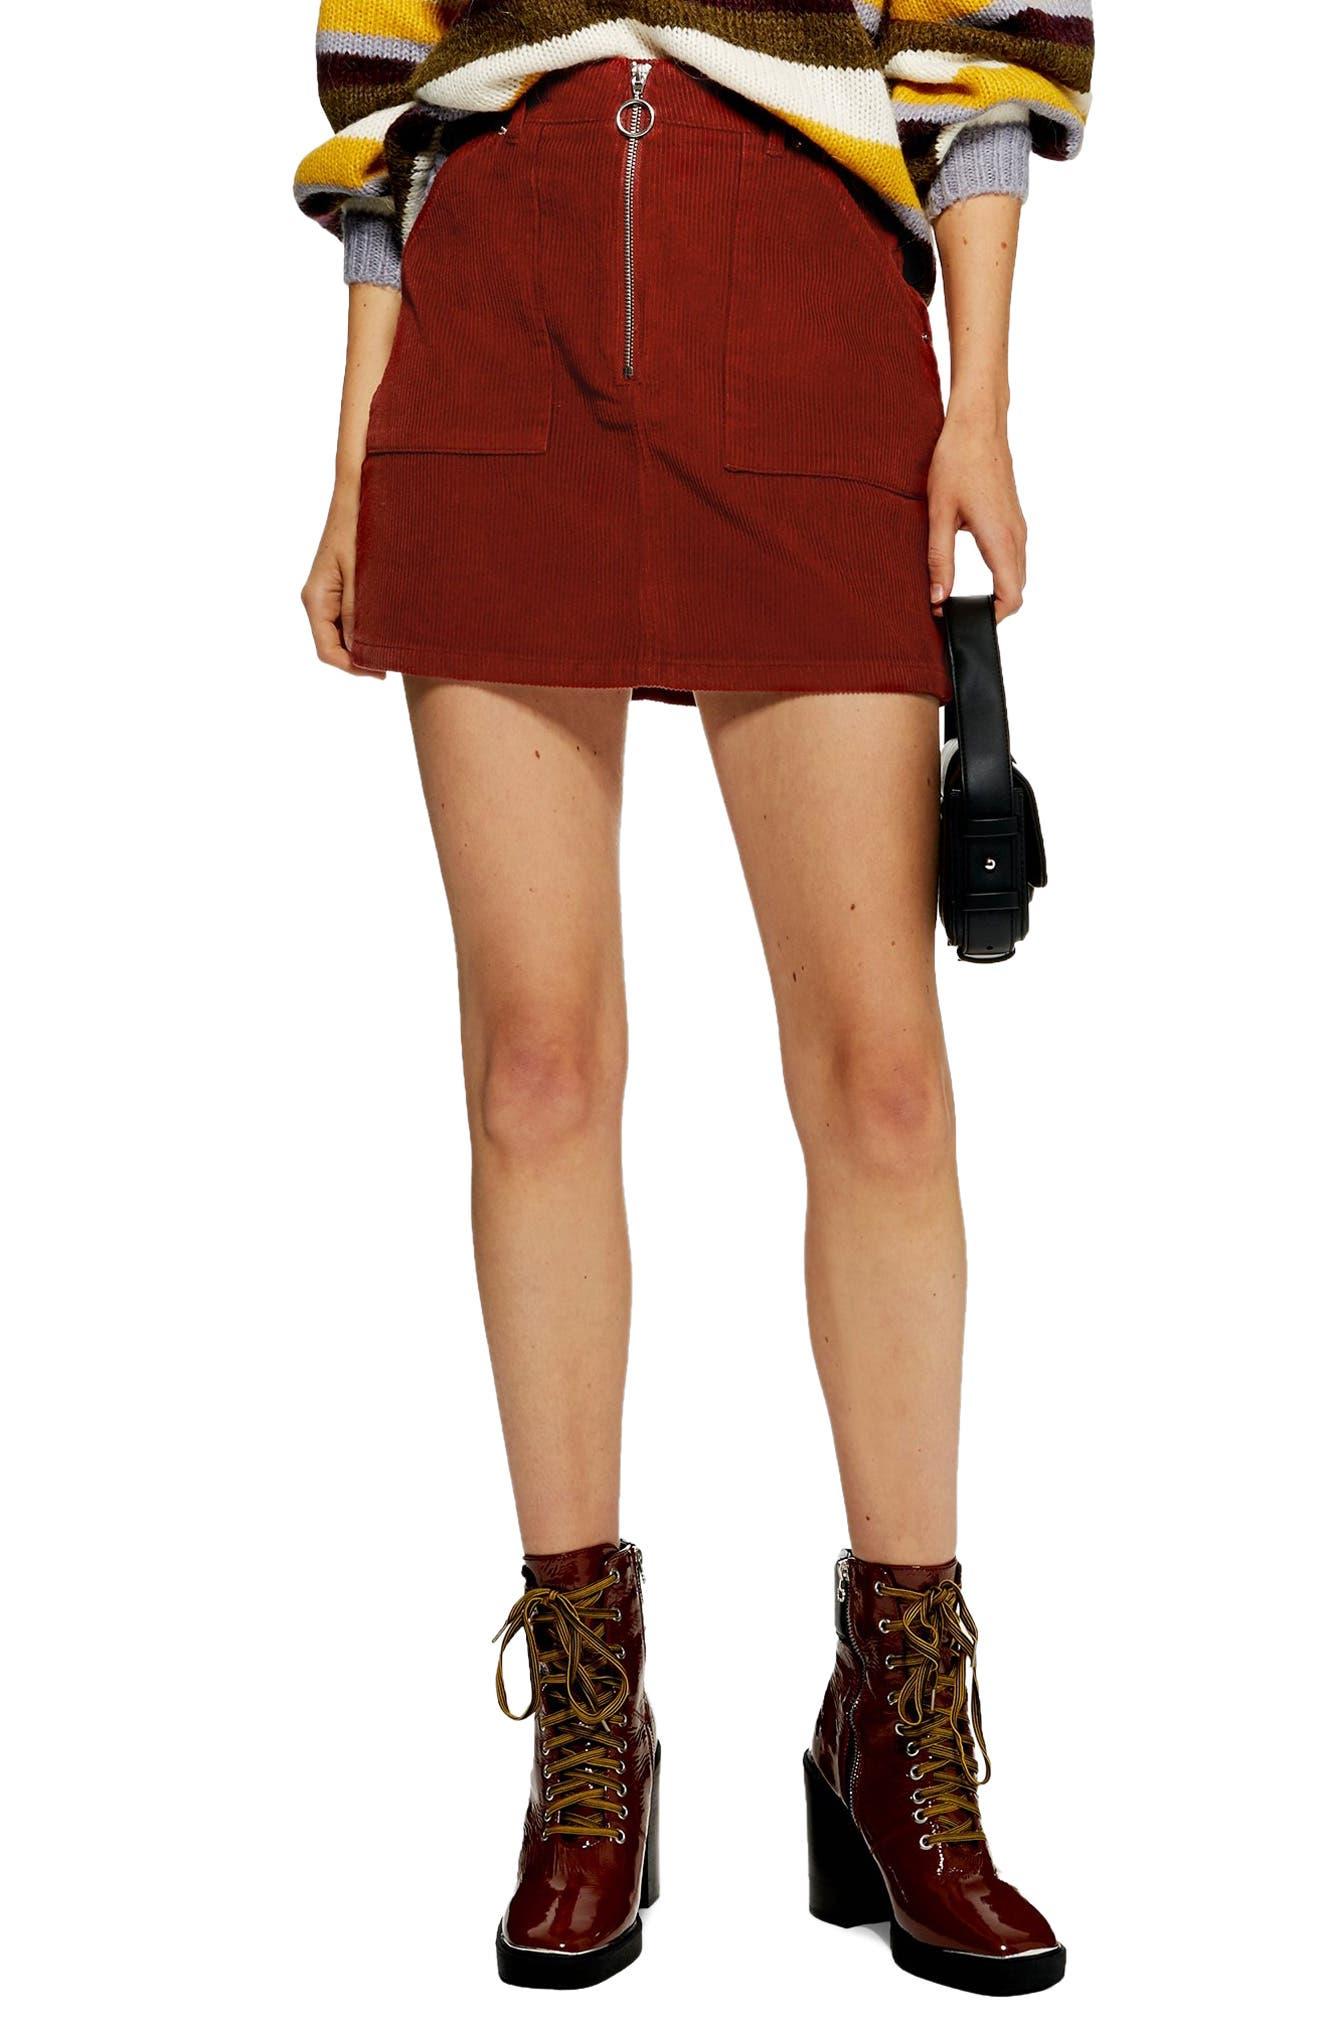 Topshop Front Zip Corduroy Miniskirt, US (fits like 14) - Metallic